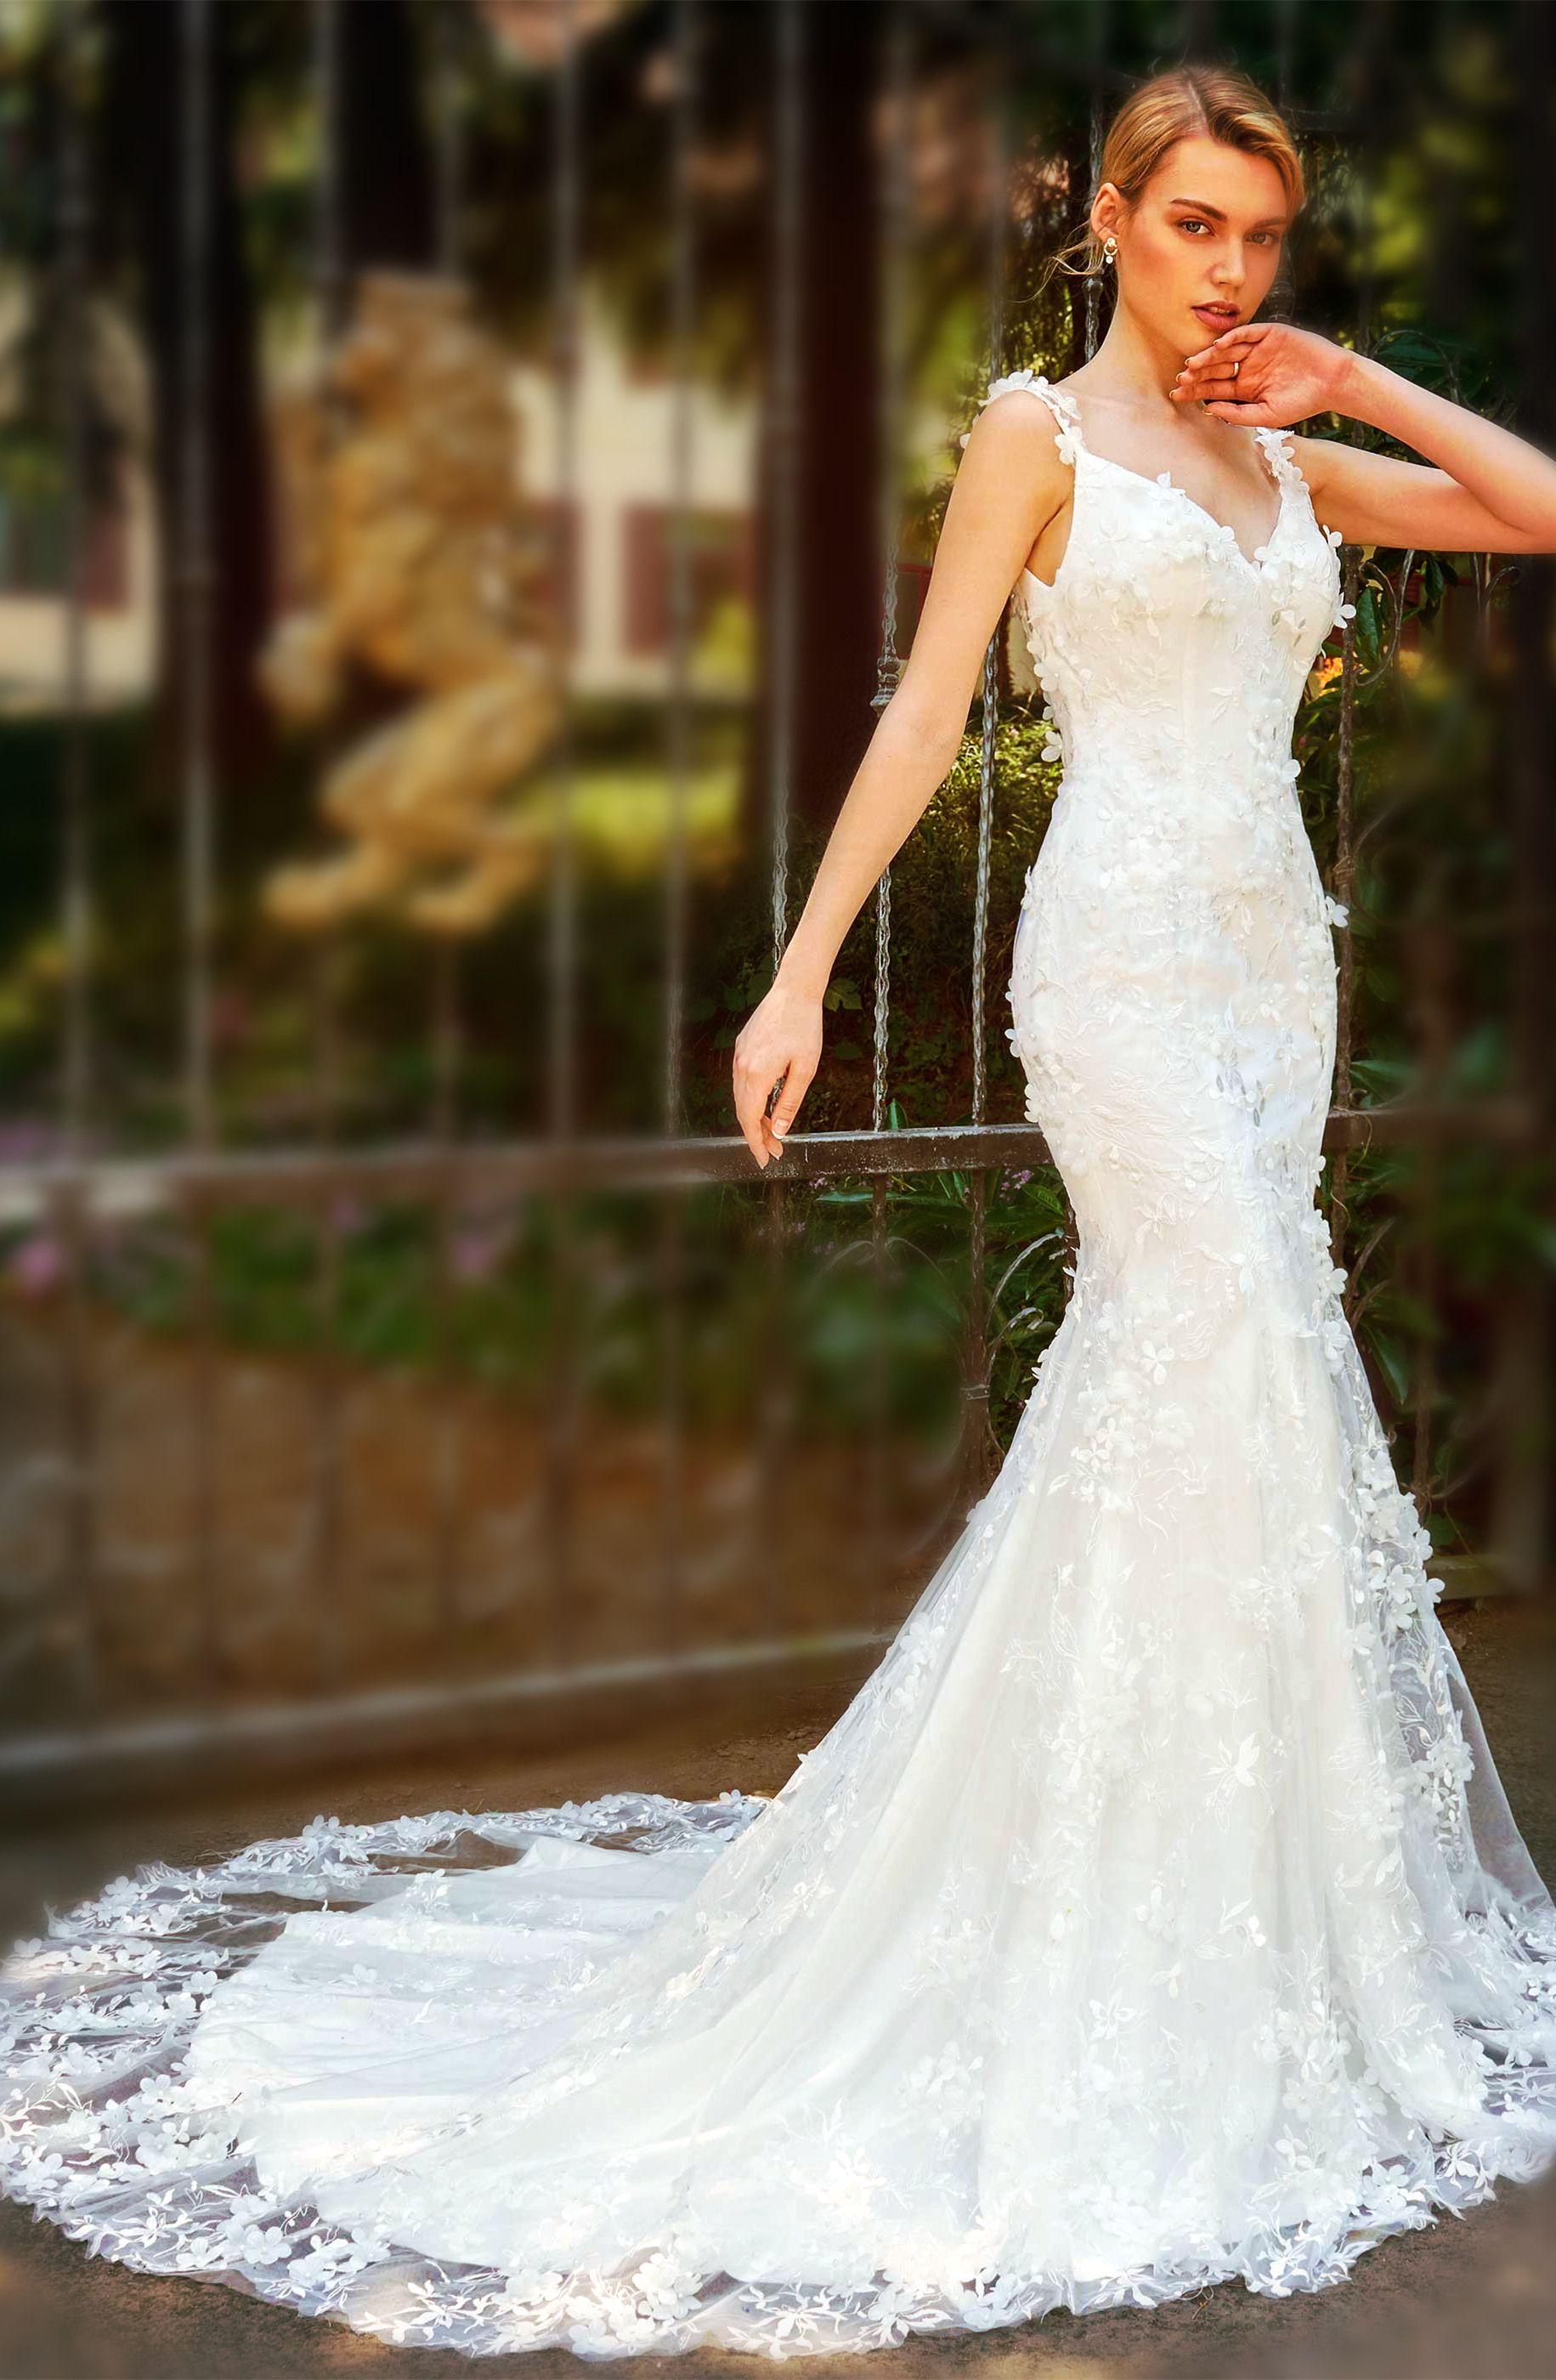 Fancy Straps Flowers Appliques Mermaid Wedding Dress Wedding Dresses Dresses Mermaid Wedding Dress [ 2800 x 1831 Pixel ]